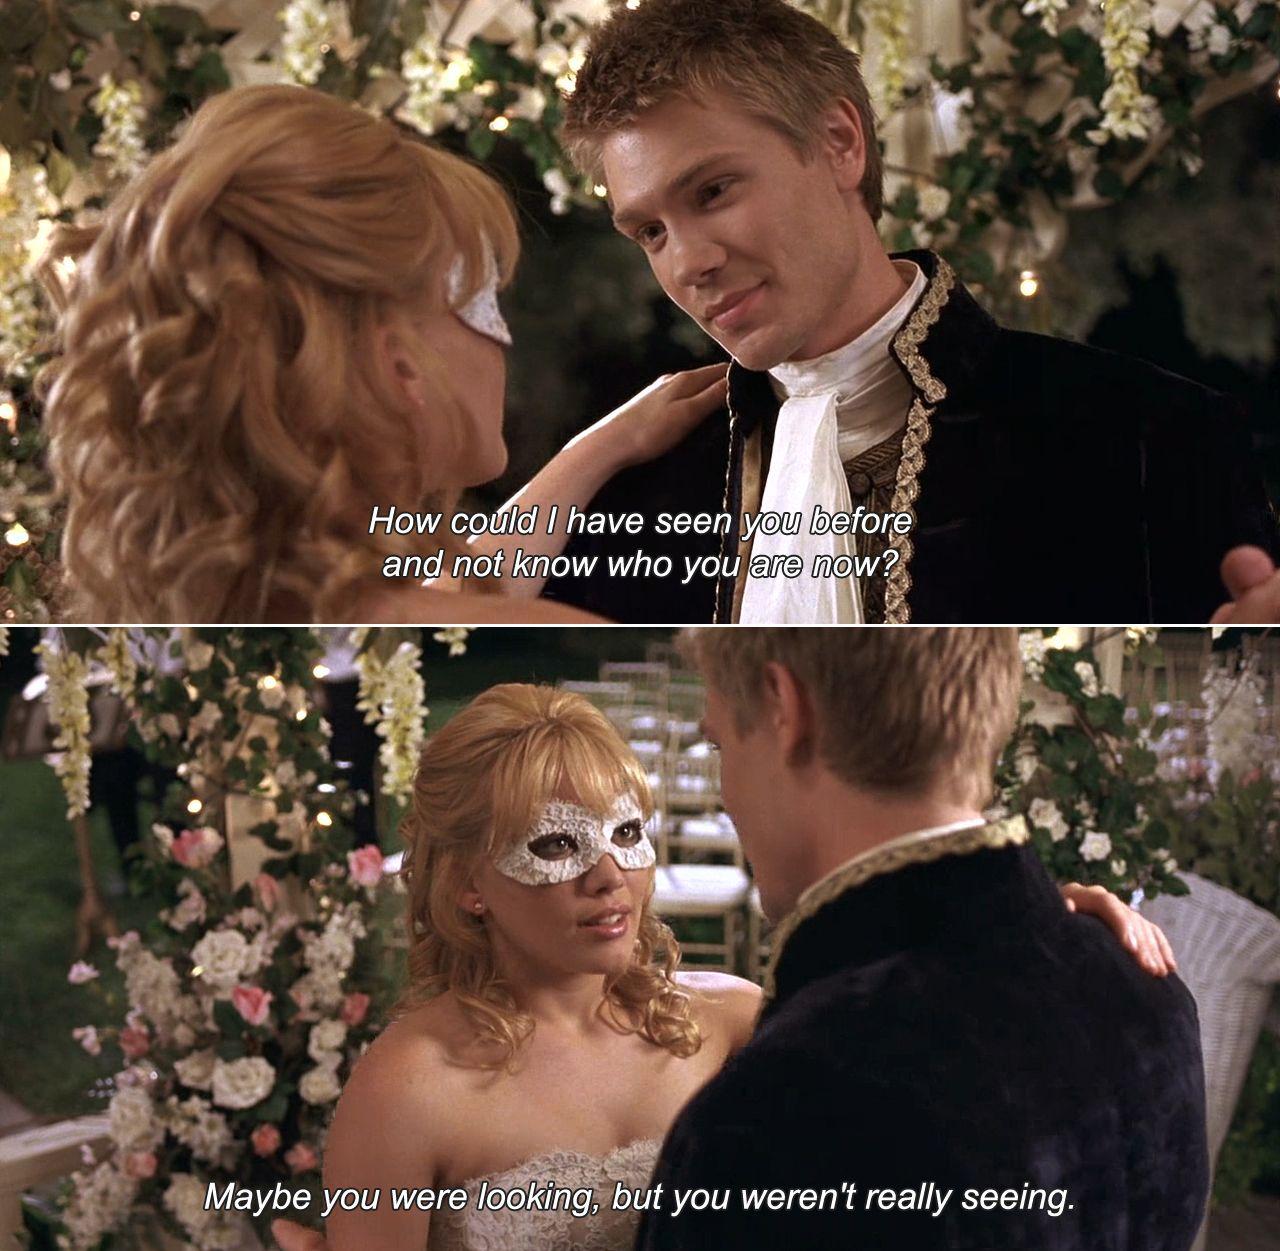 Cinderella Man Quotes A Cinderella Story  The Cinema  Pinterest  Movie Tvs And Movie Tv